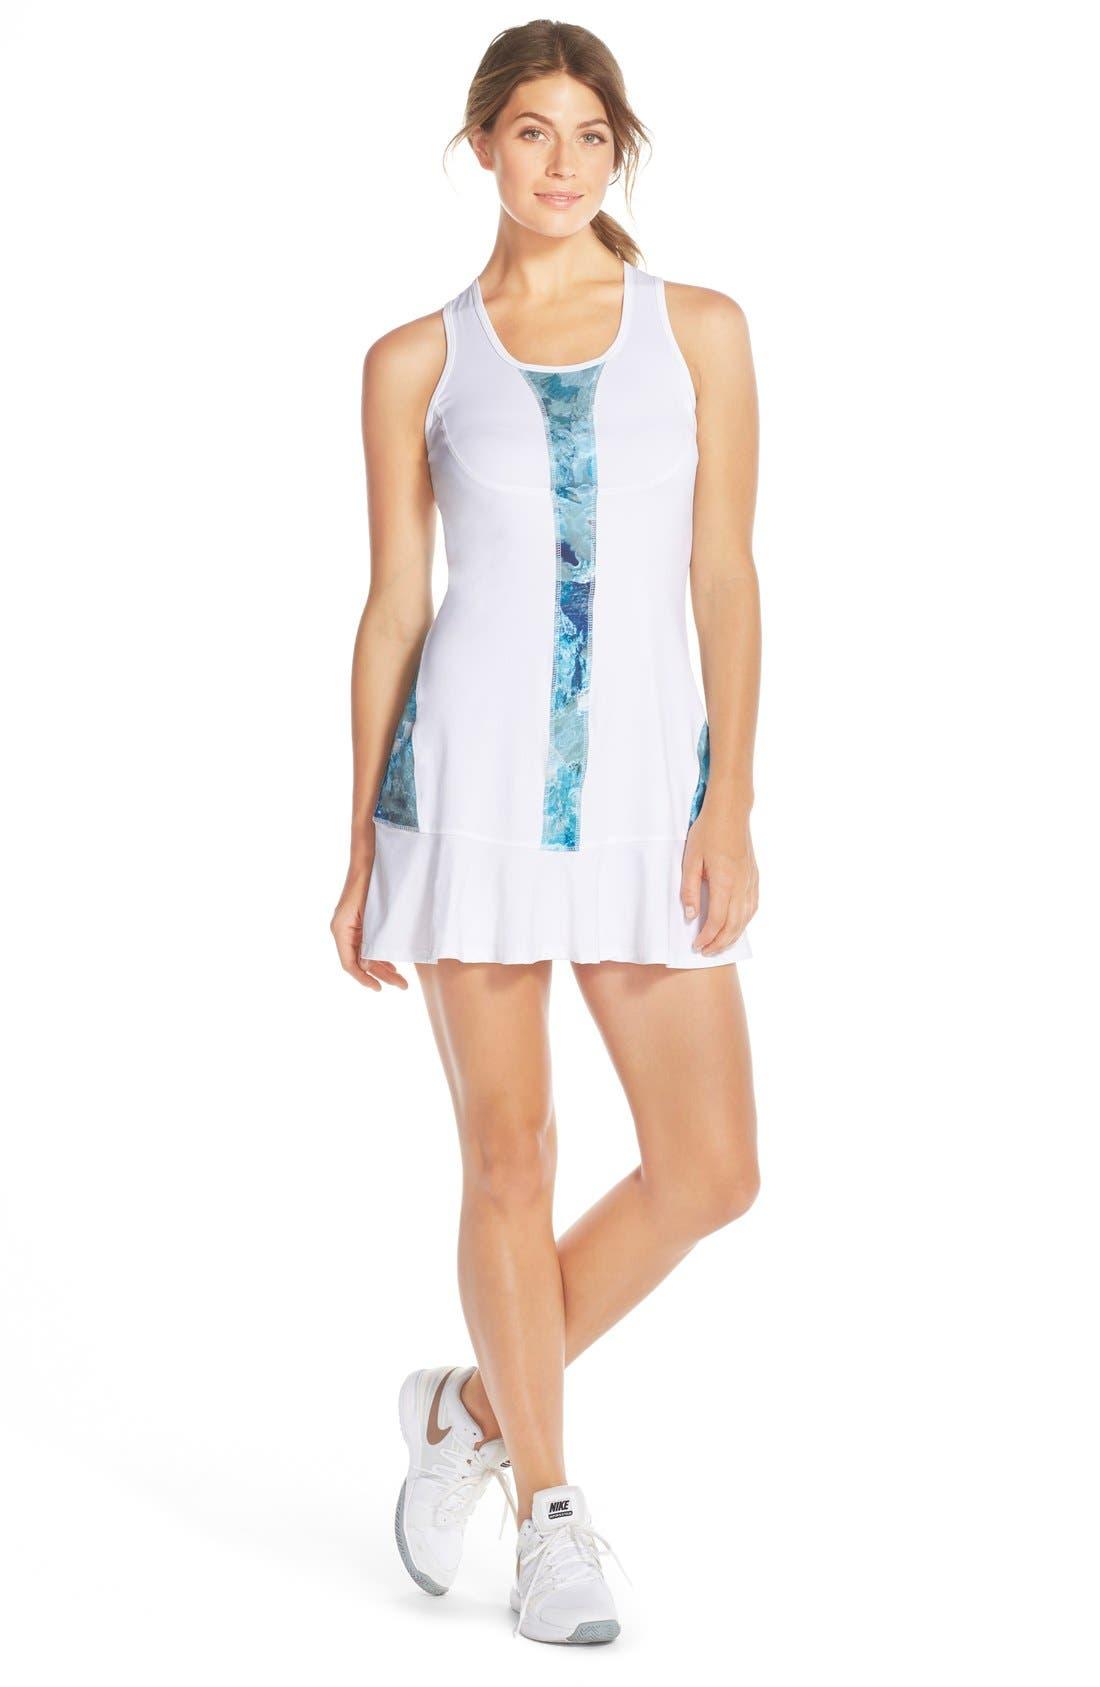 'Full Court' Tennis Dress,                             Main thumbnail 1, color,                             100